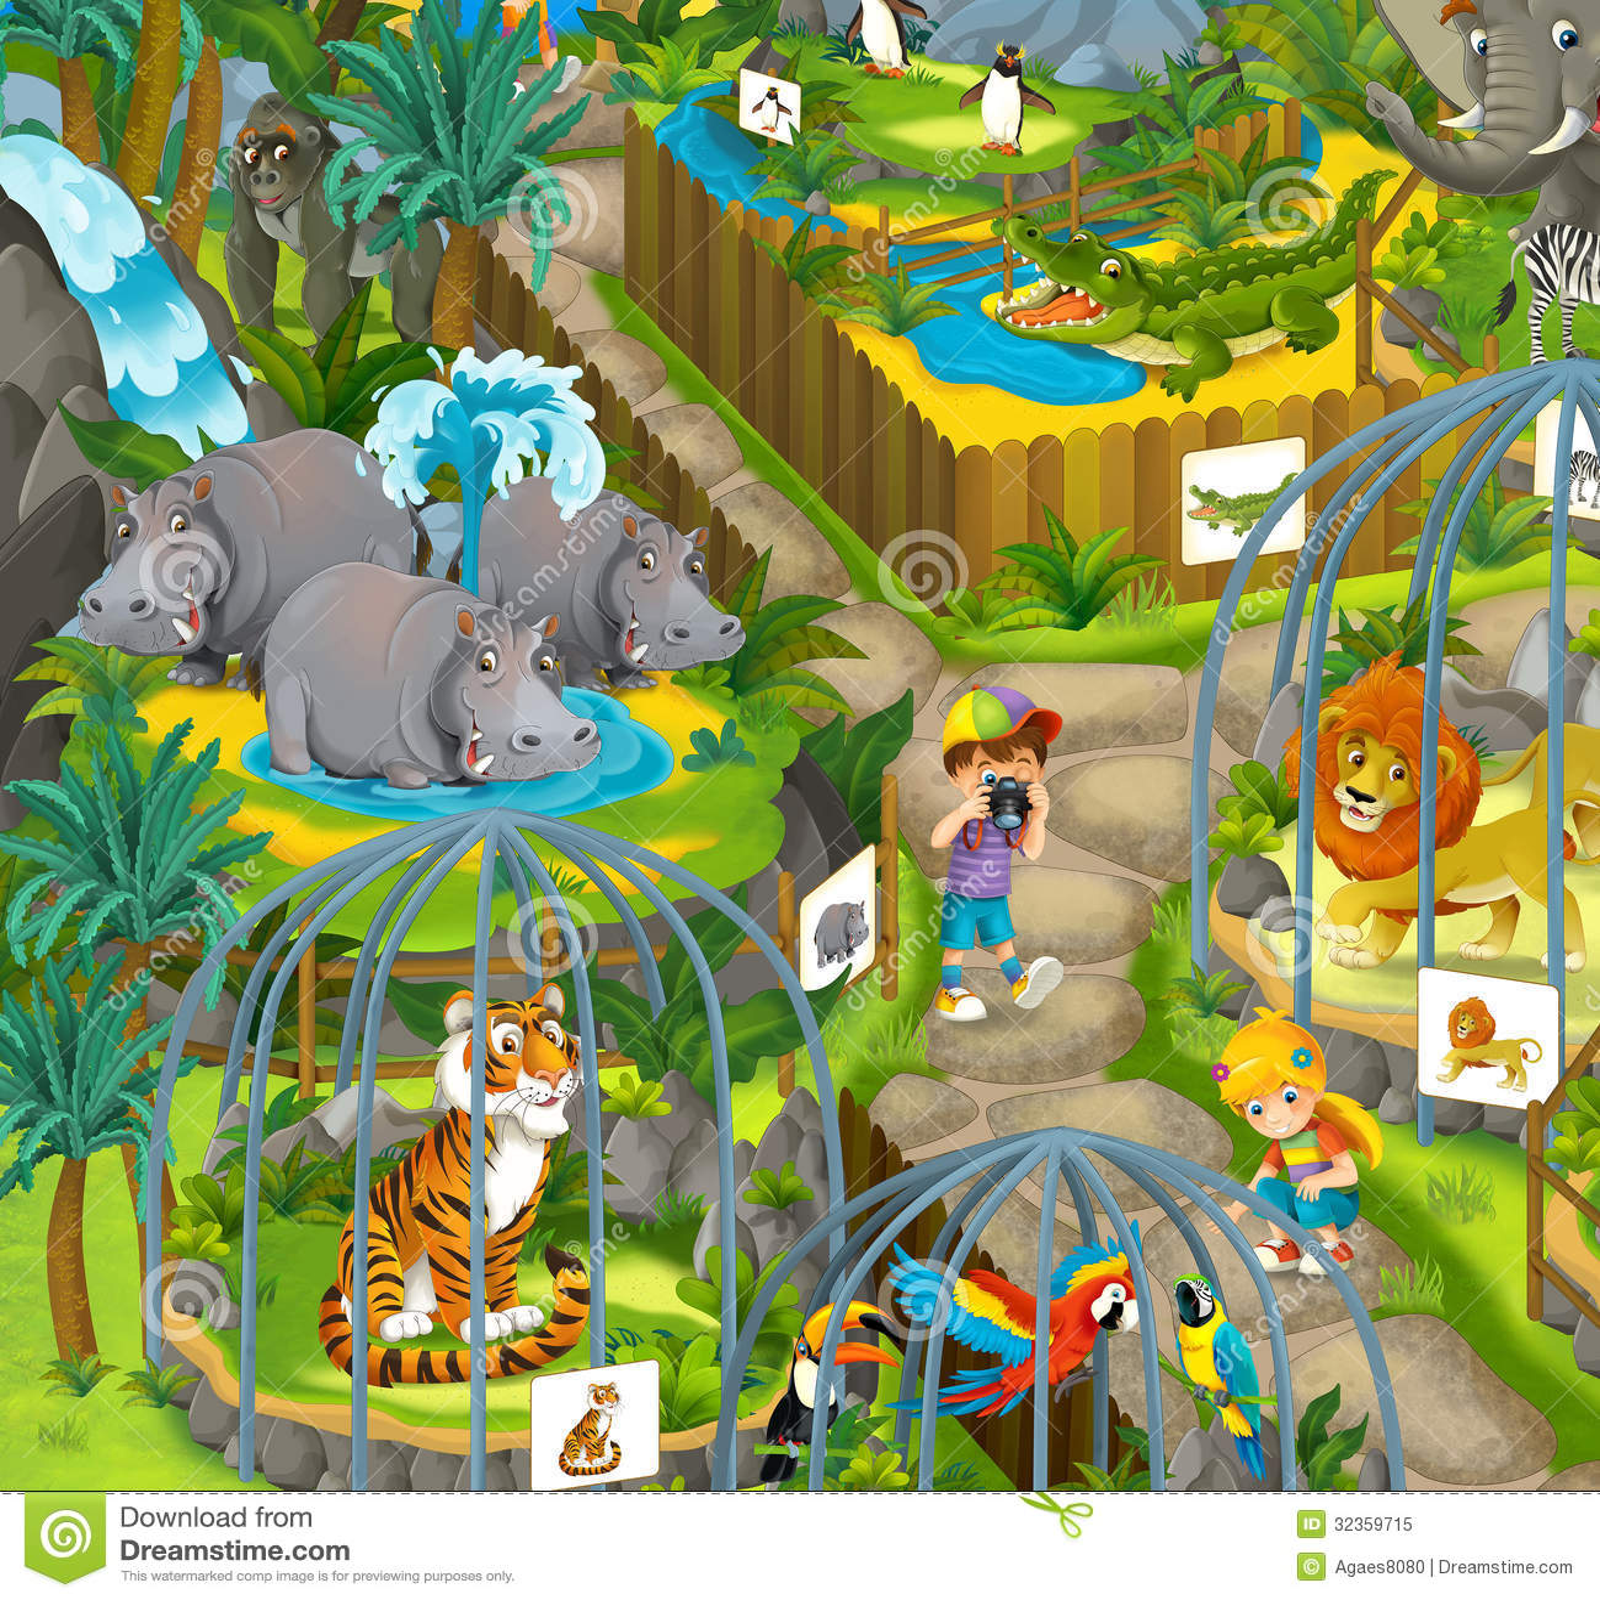 Playground Illustration Png